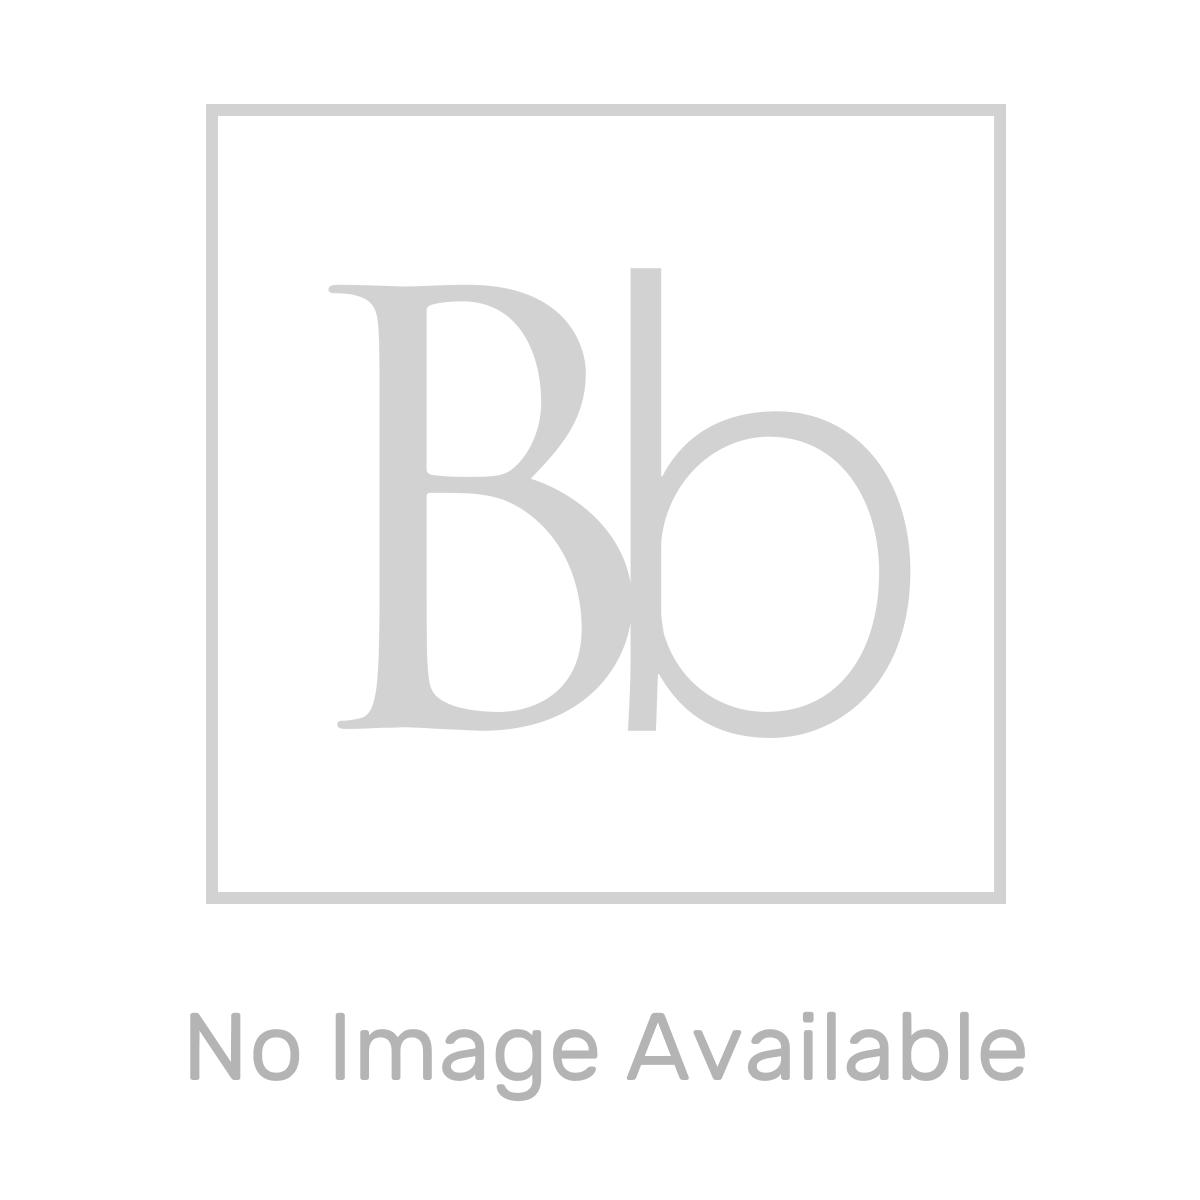 RAK Washington Black Bathroom Mirror 800mm